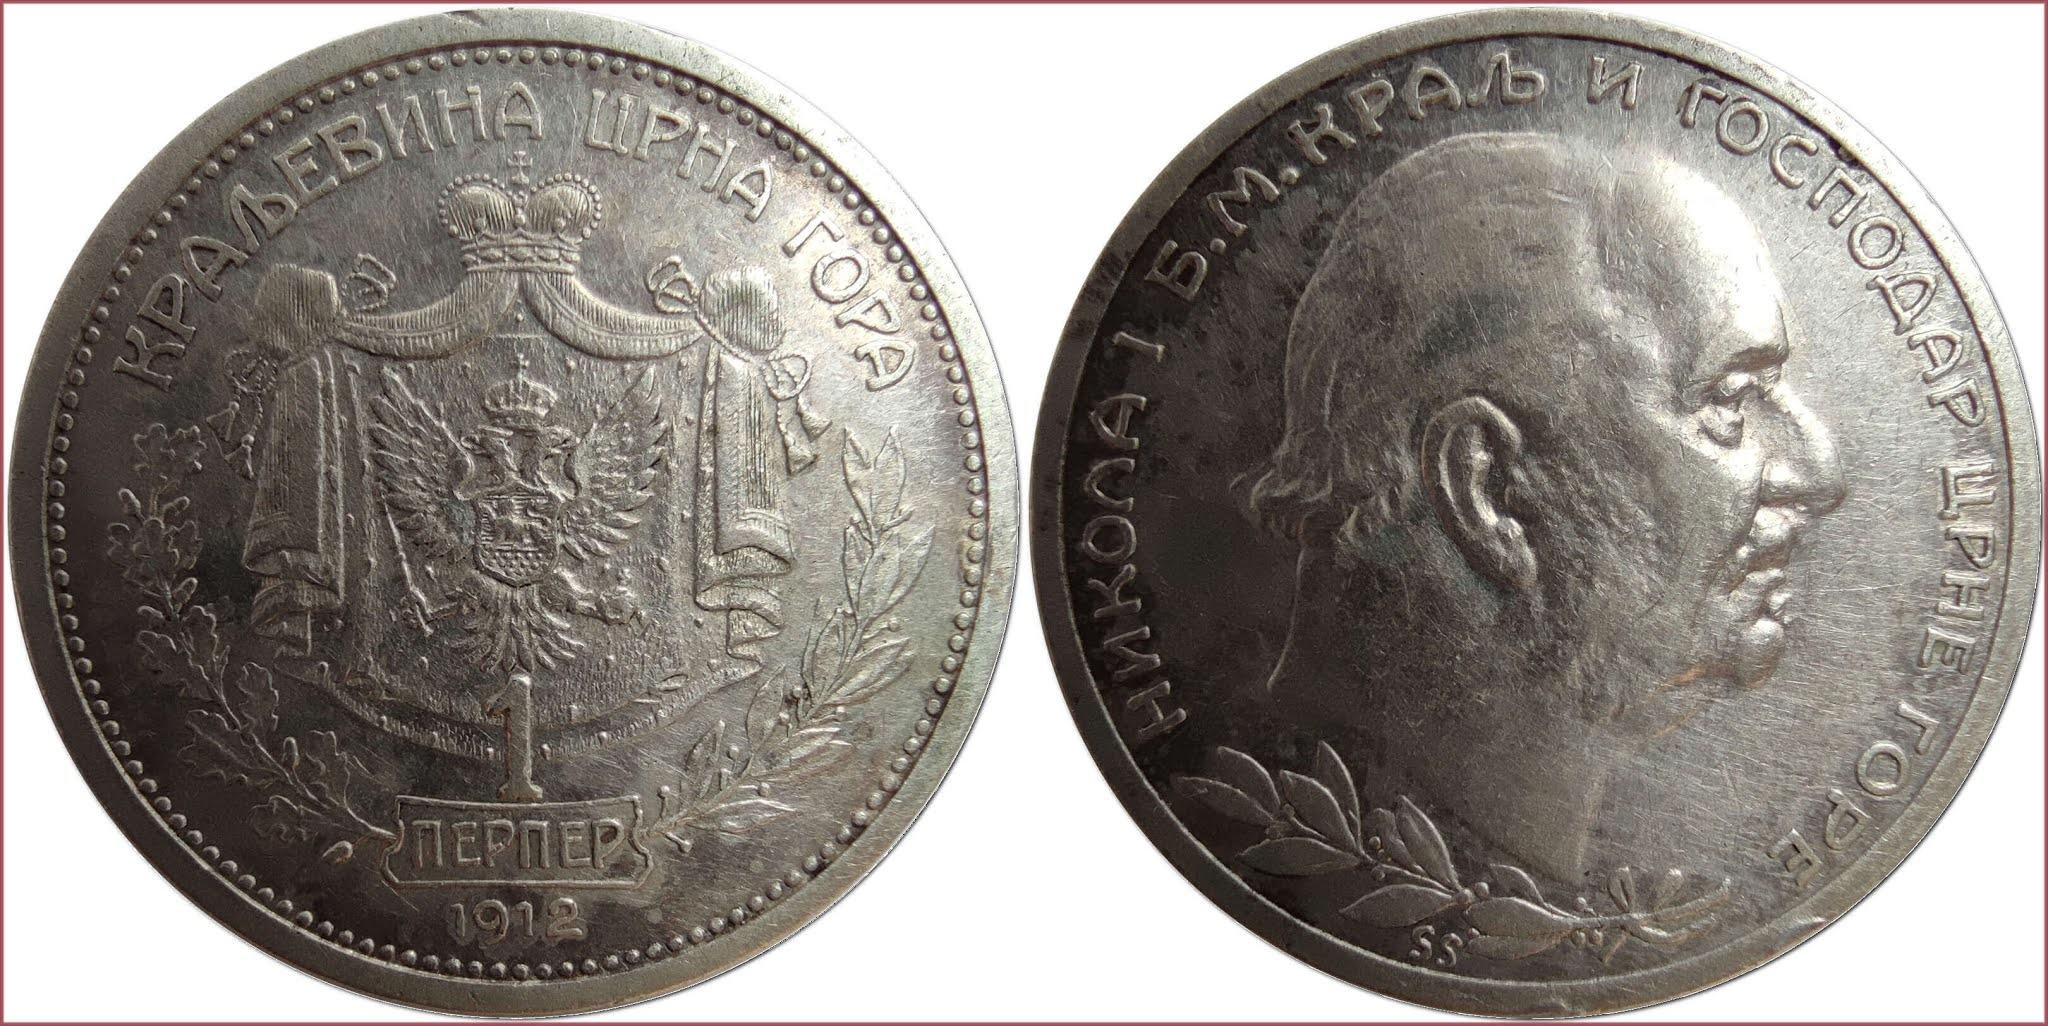 1 perper (перпер), 1912: Kingdom of Montenegro